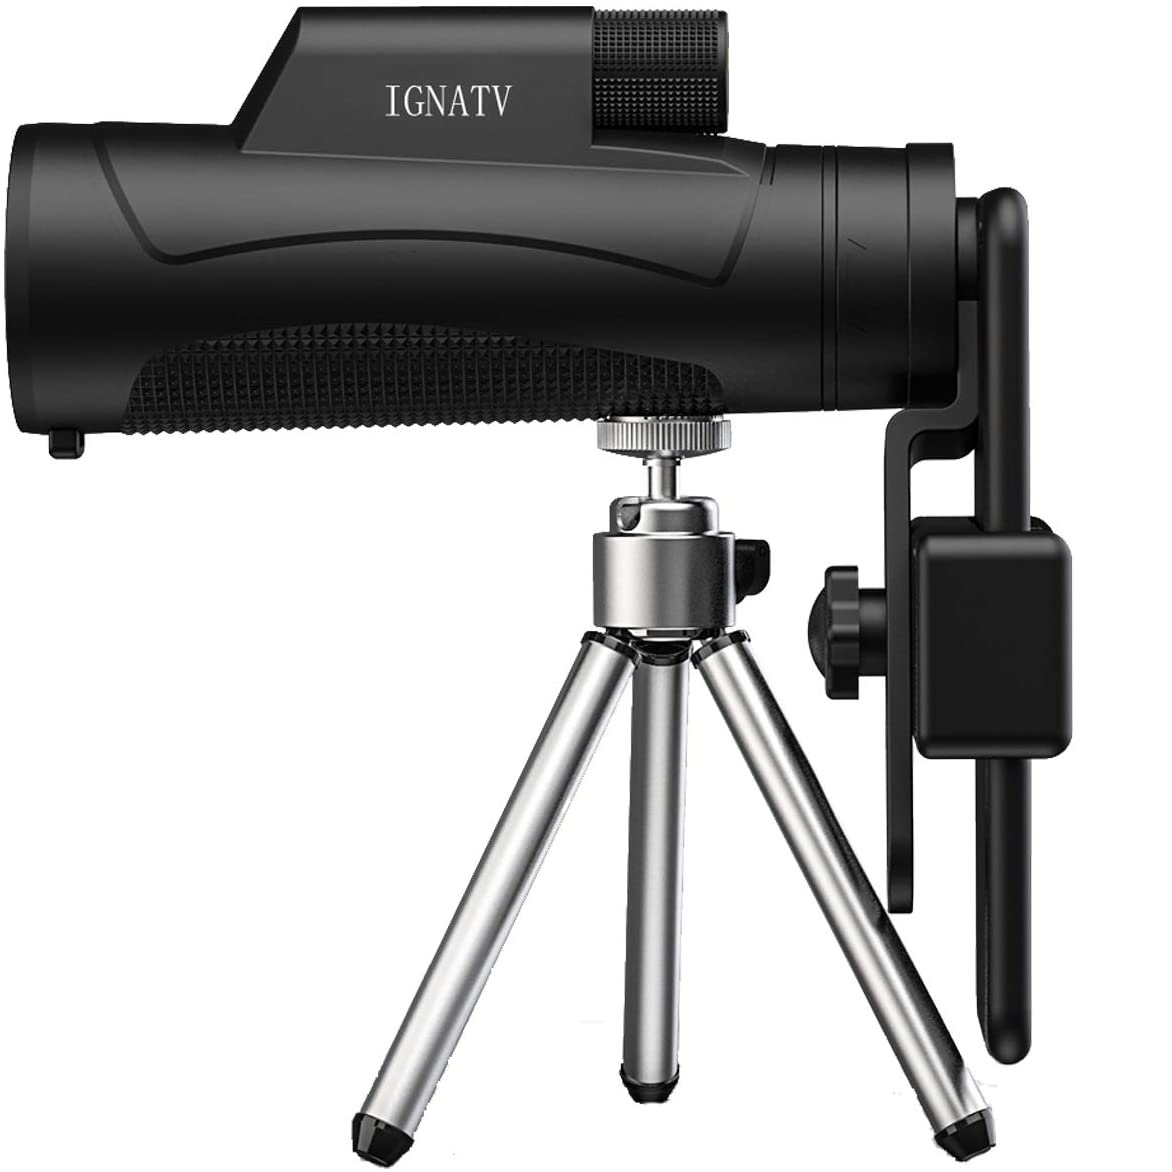 دوربین تک چشمی ایگناتیو مدل 12X50